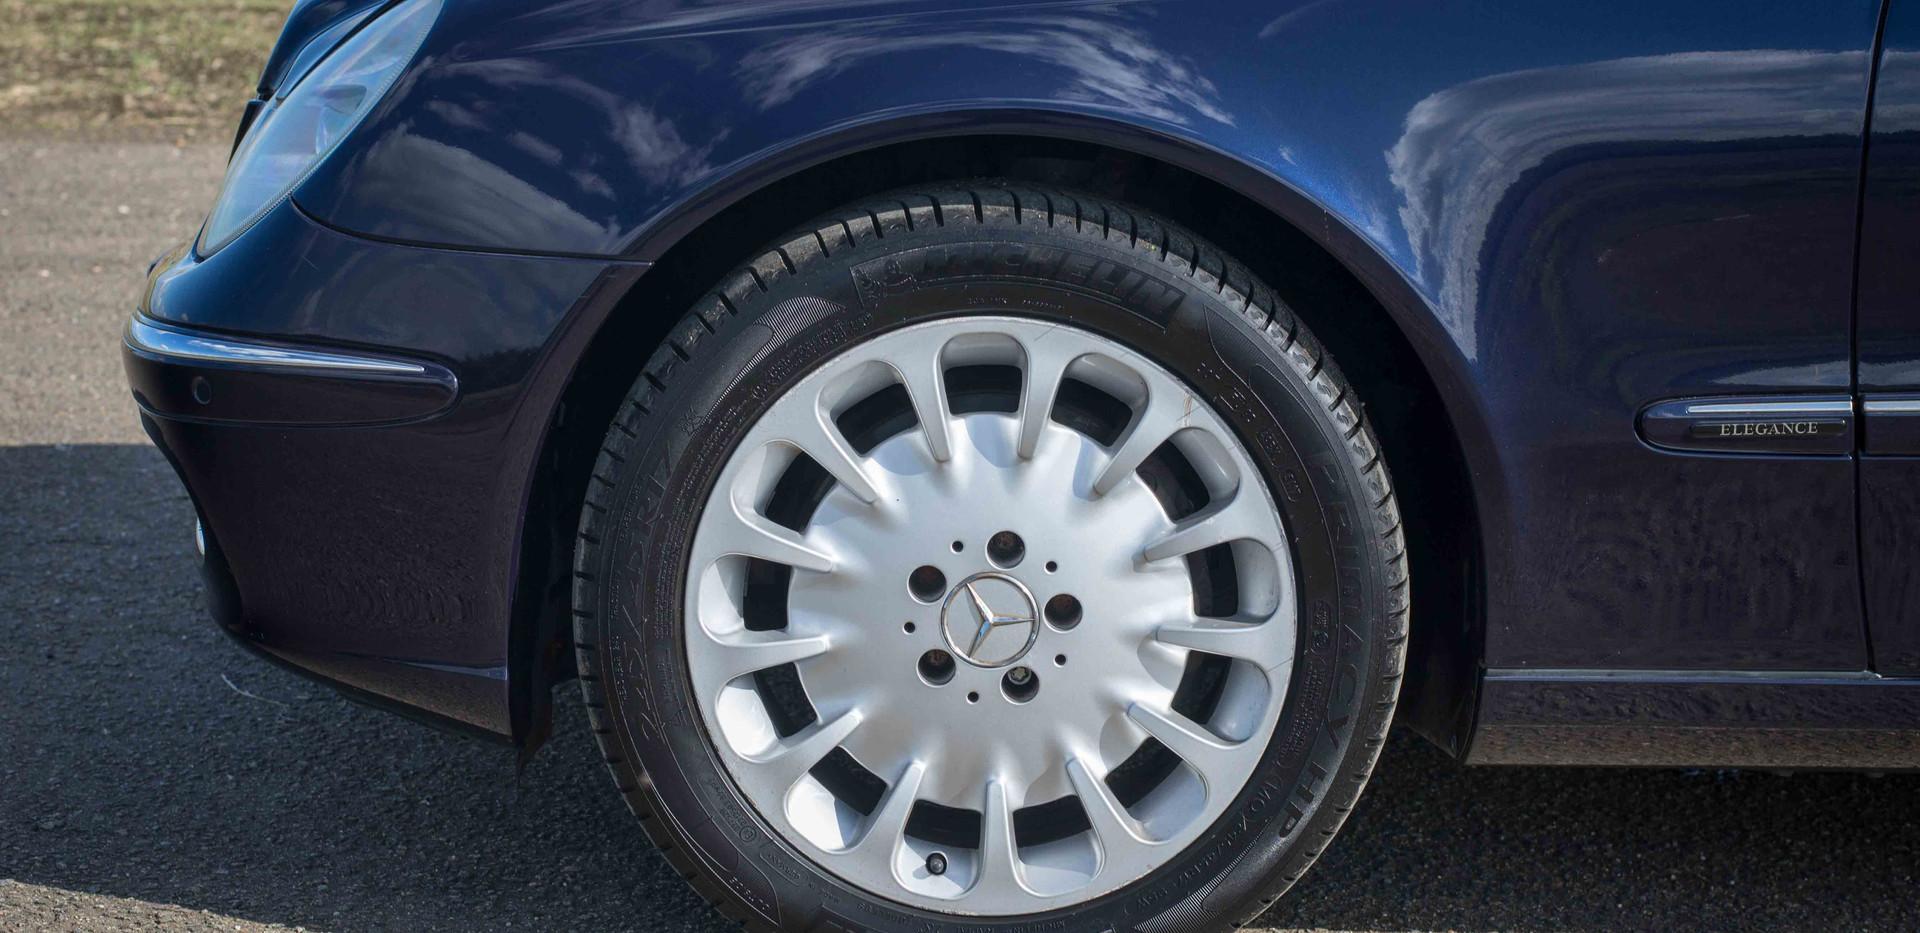 Mercedes E500 For Sale UK London  (6 of